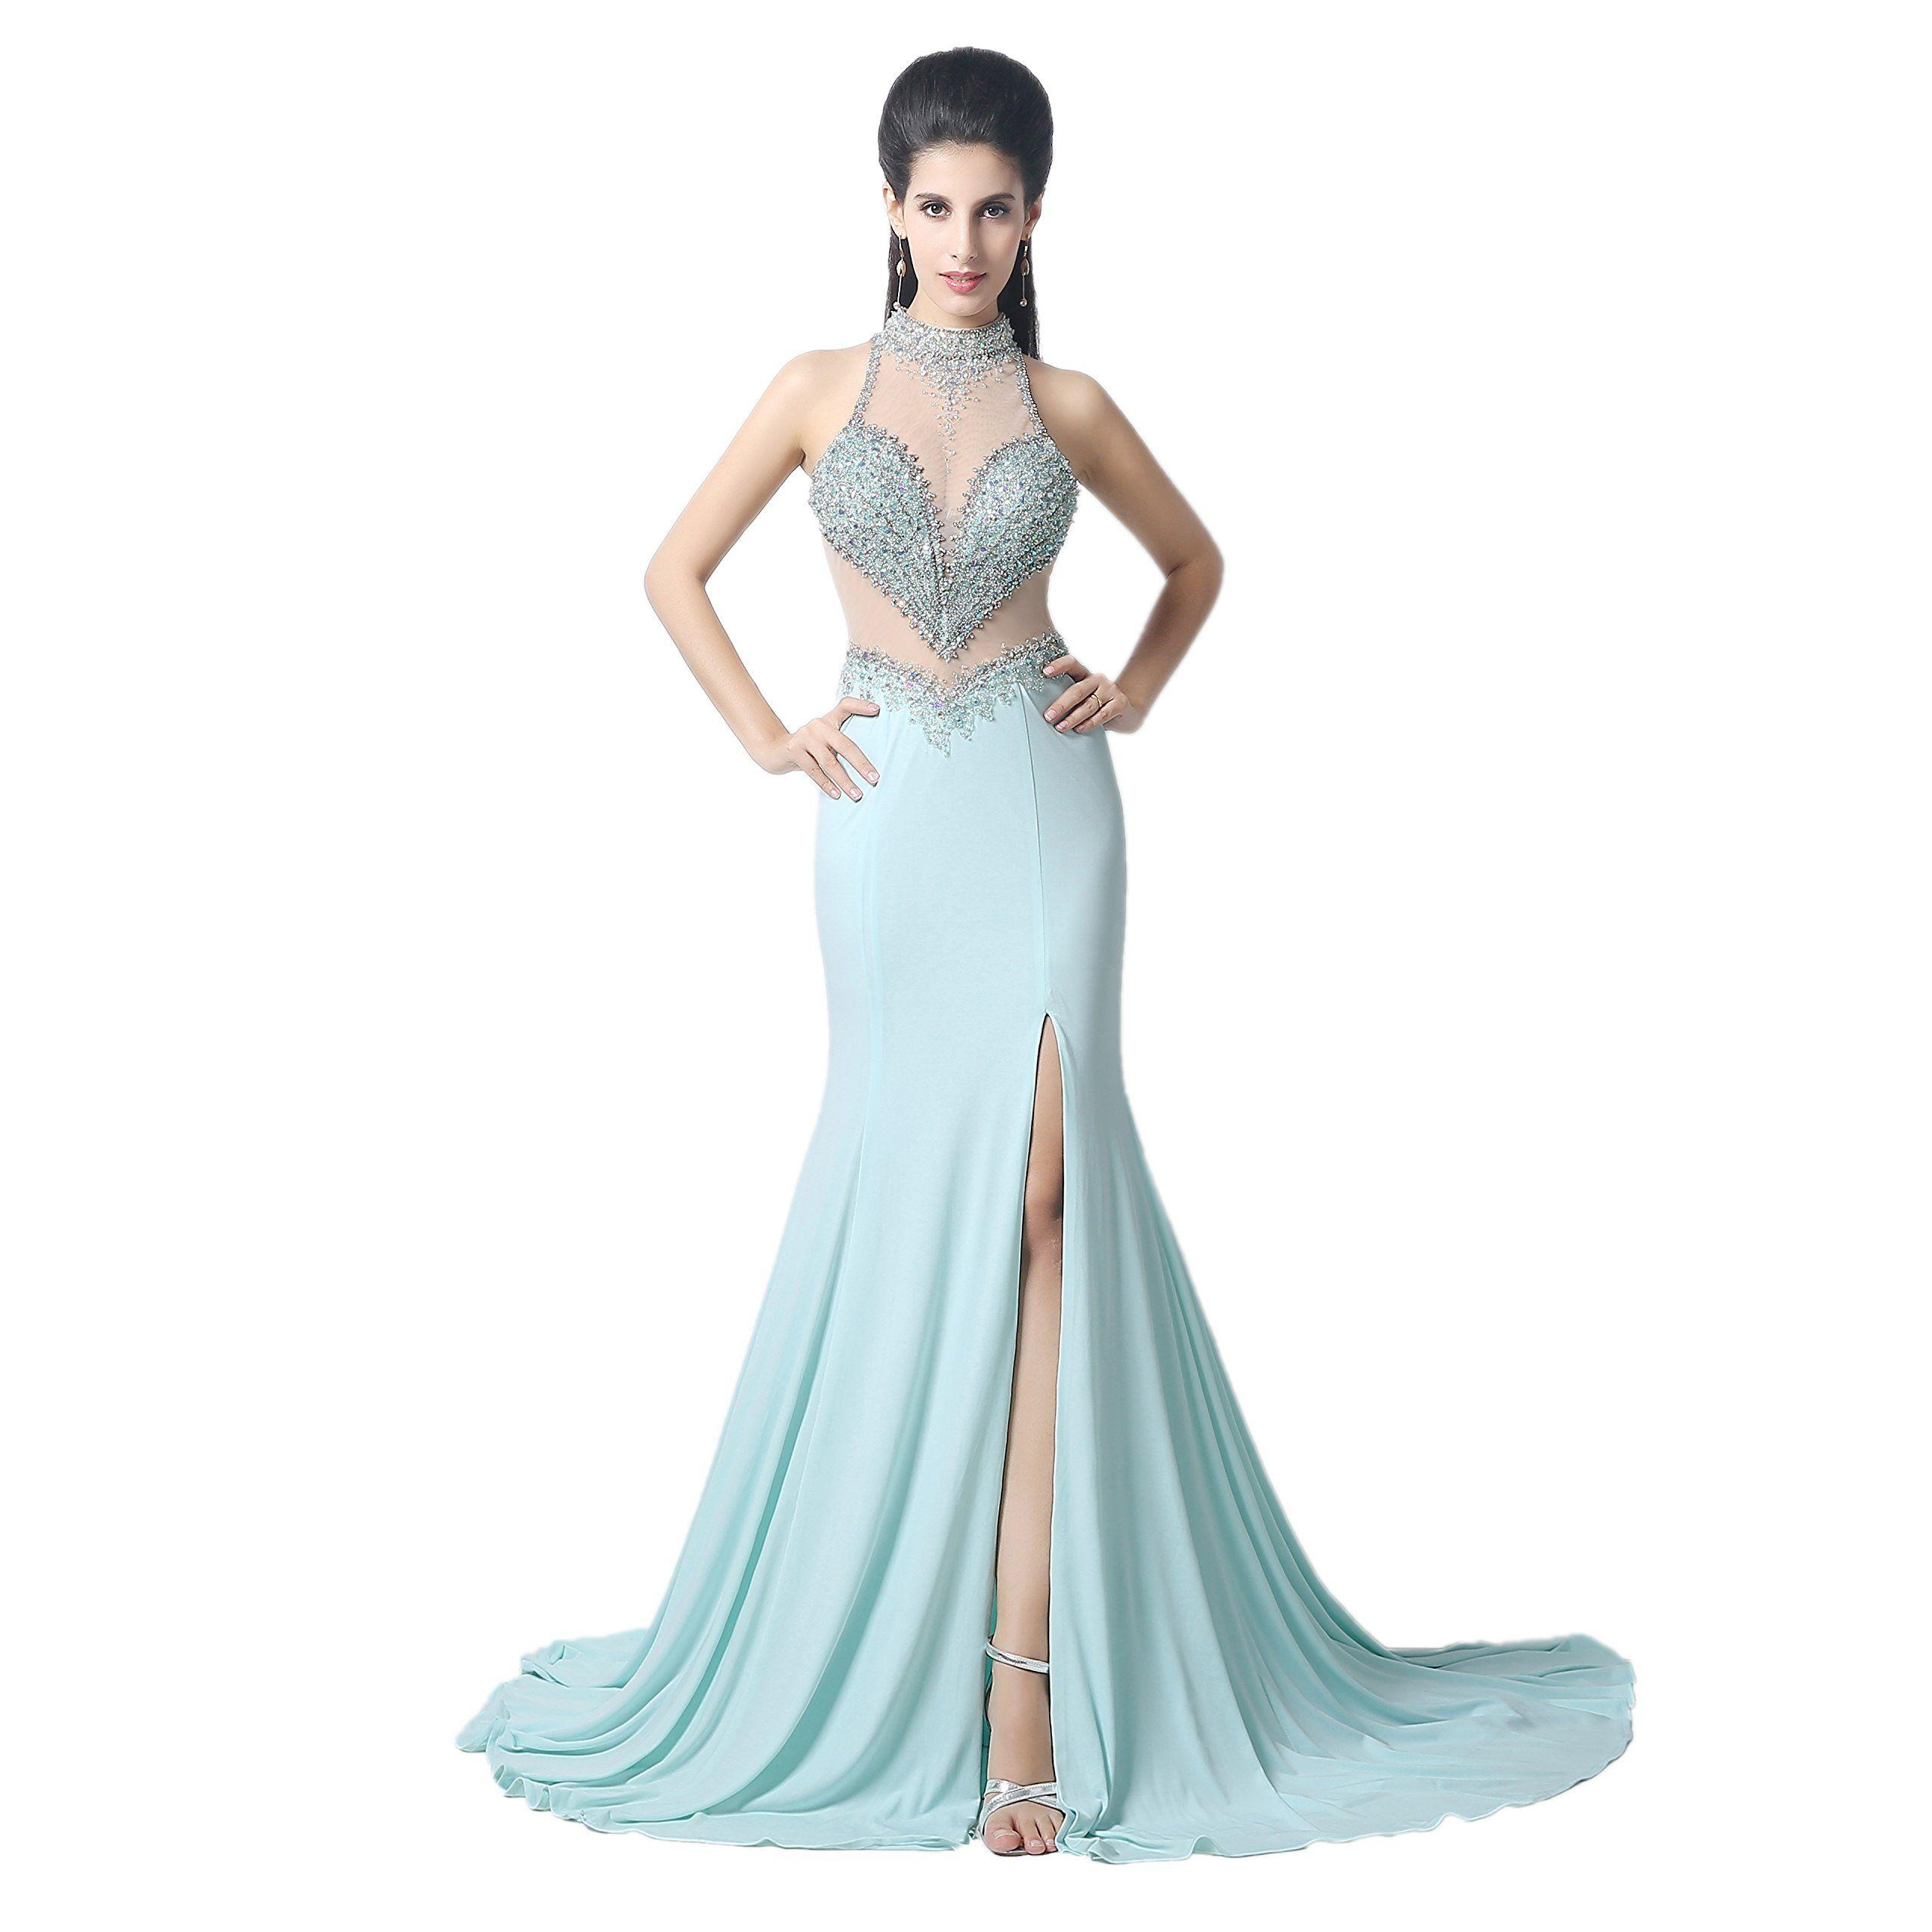 Dreamdress womenus mermaid split beads evening dresses party prom